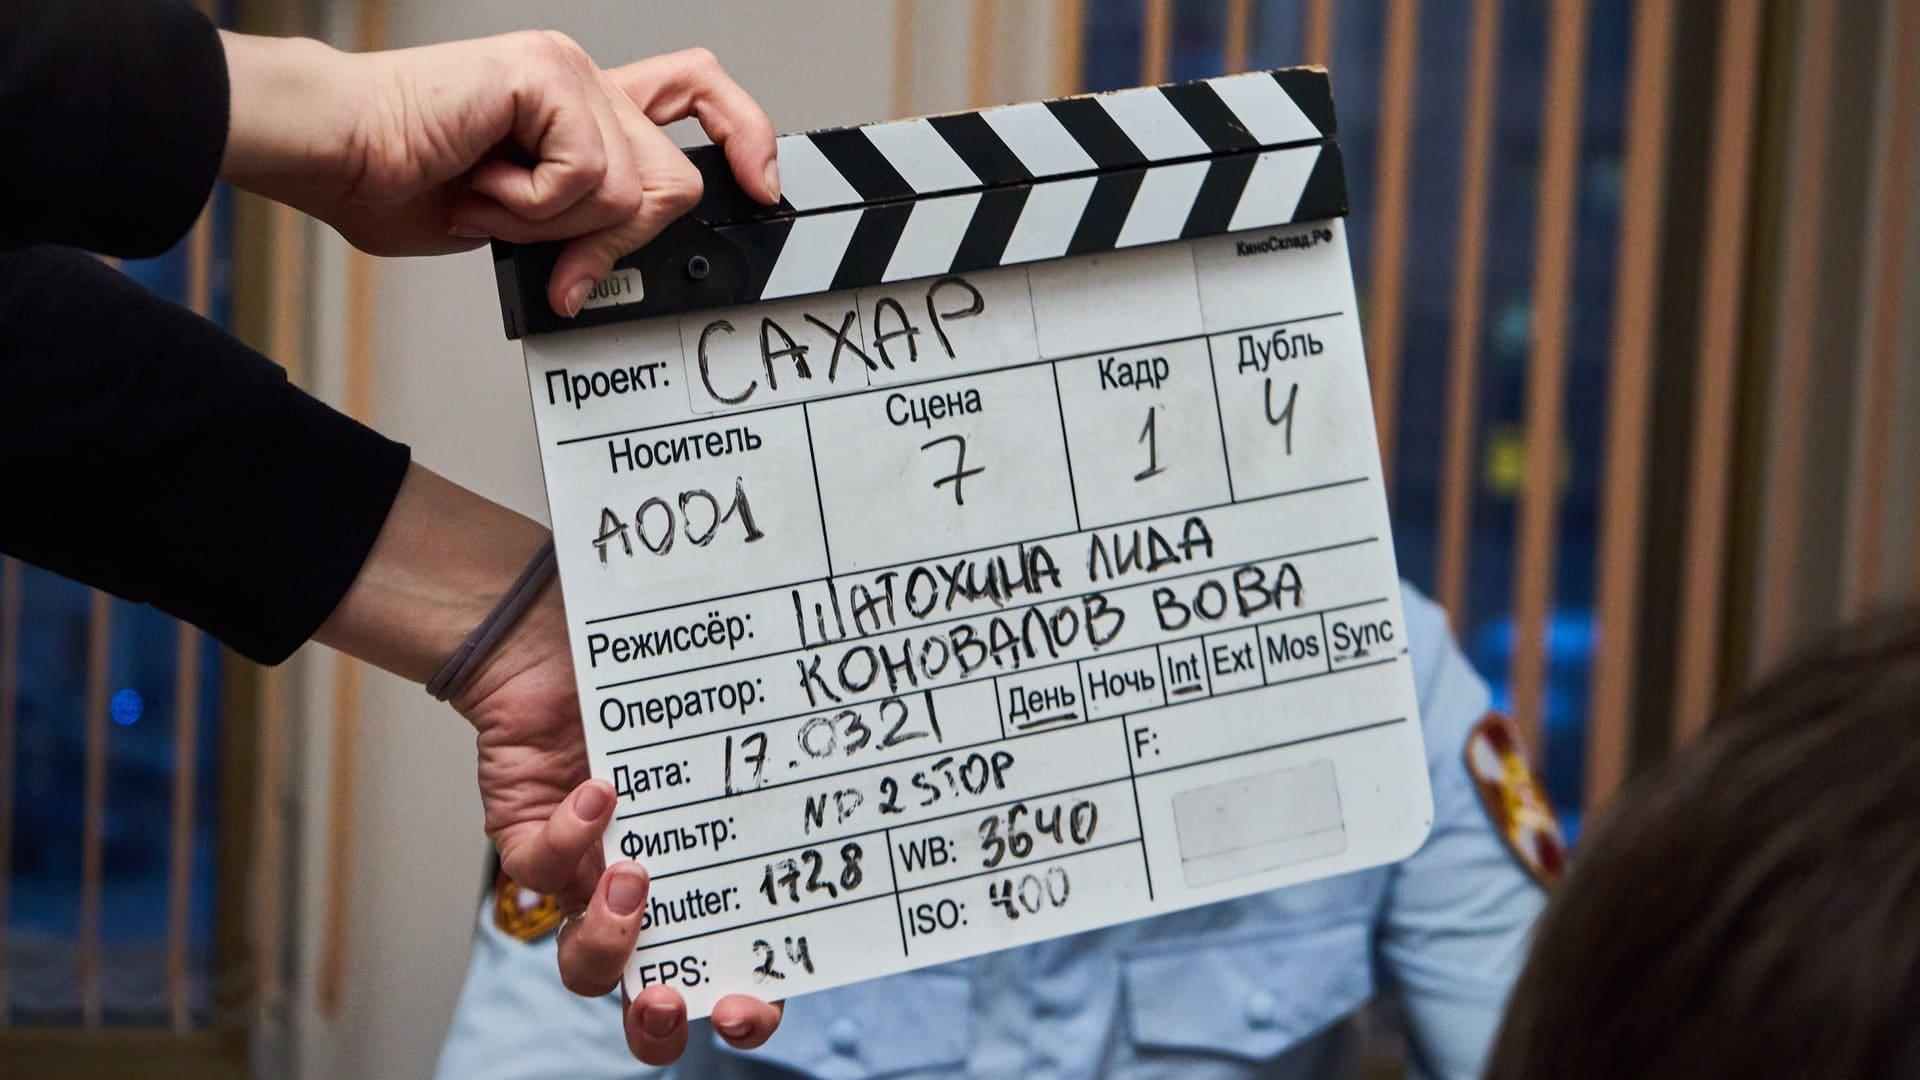 filmgyar filmhu nemzeti filmintezet podcast filmipar